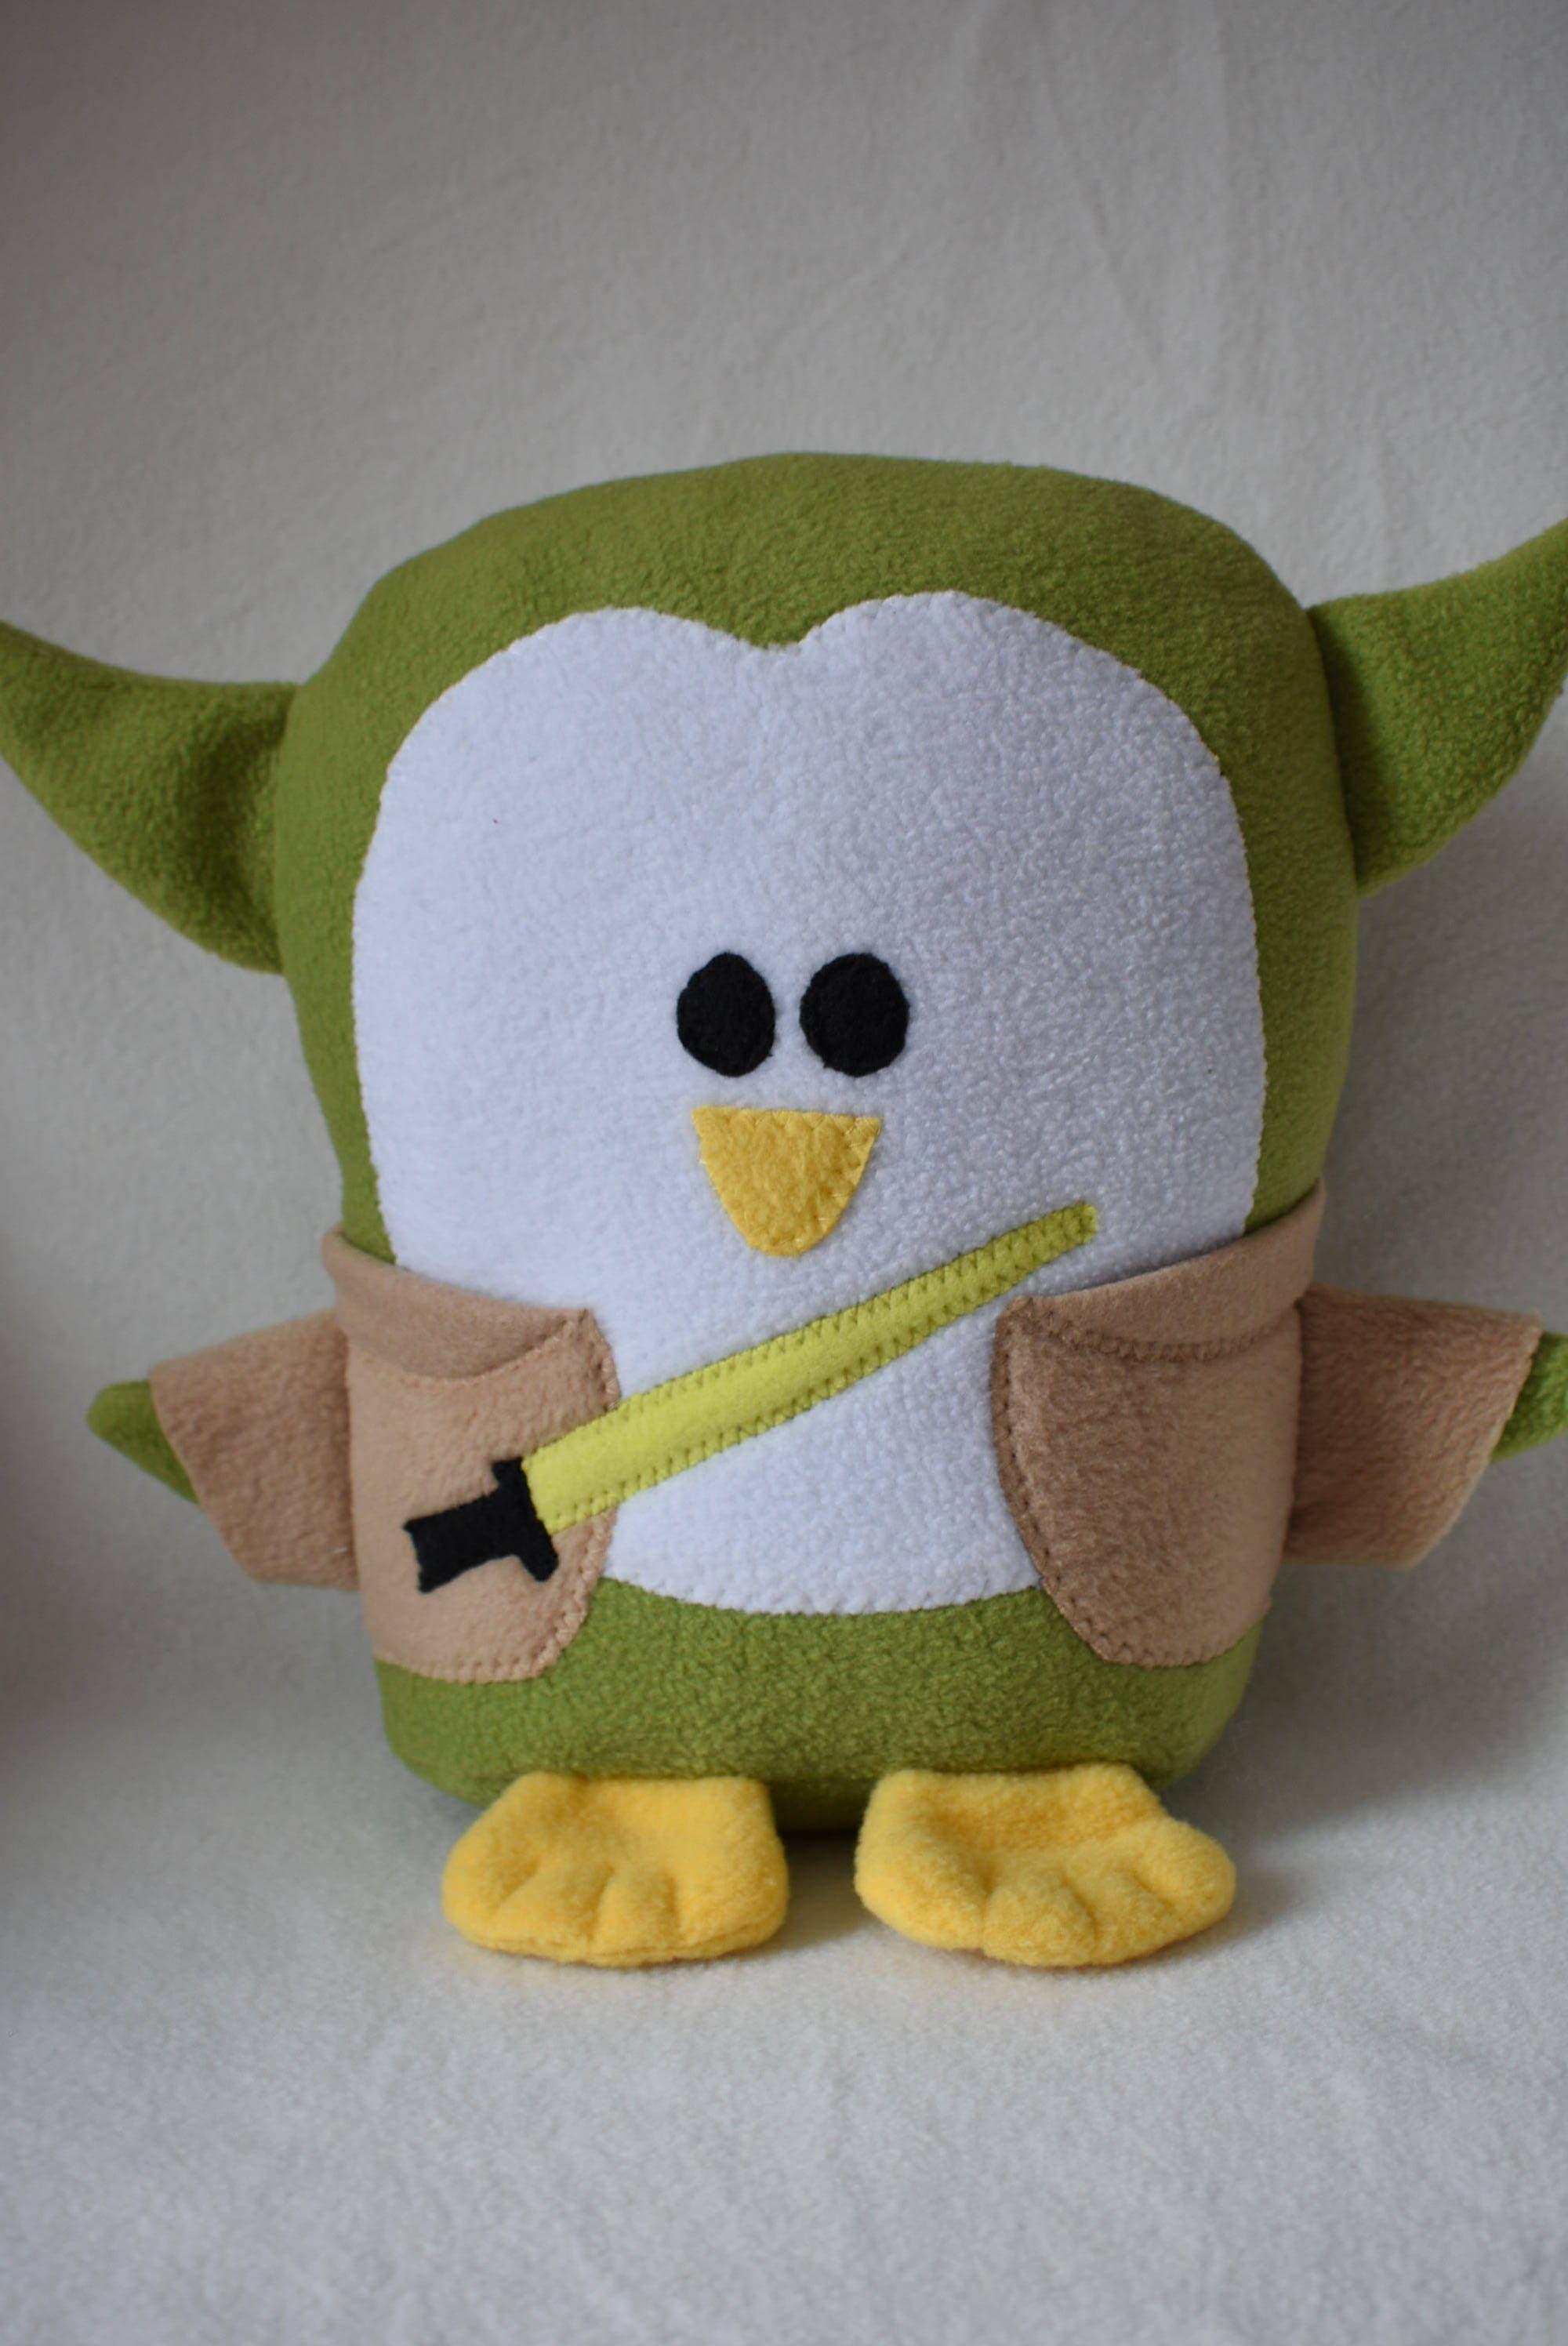 Plush Yoda Penguin Pillow, Baby Safe, Machine Wash and Dry